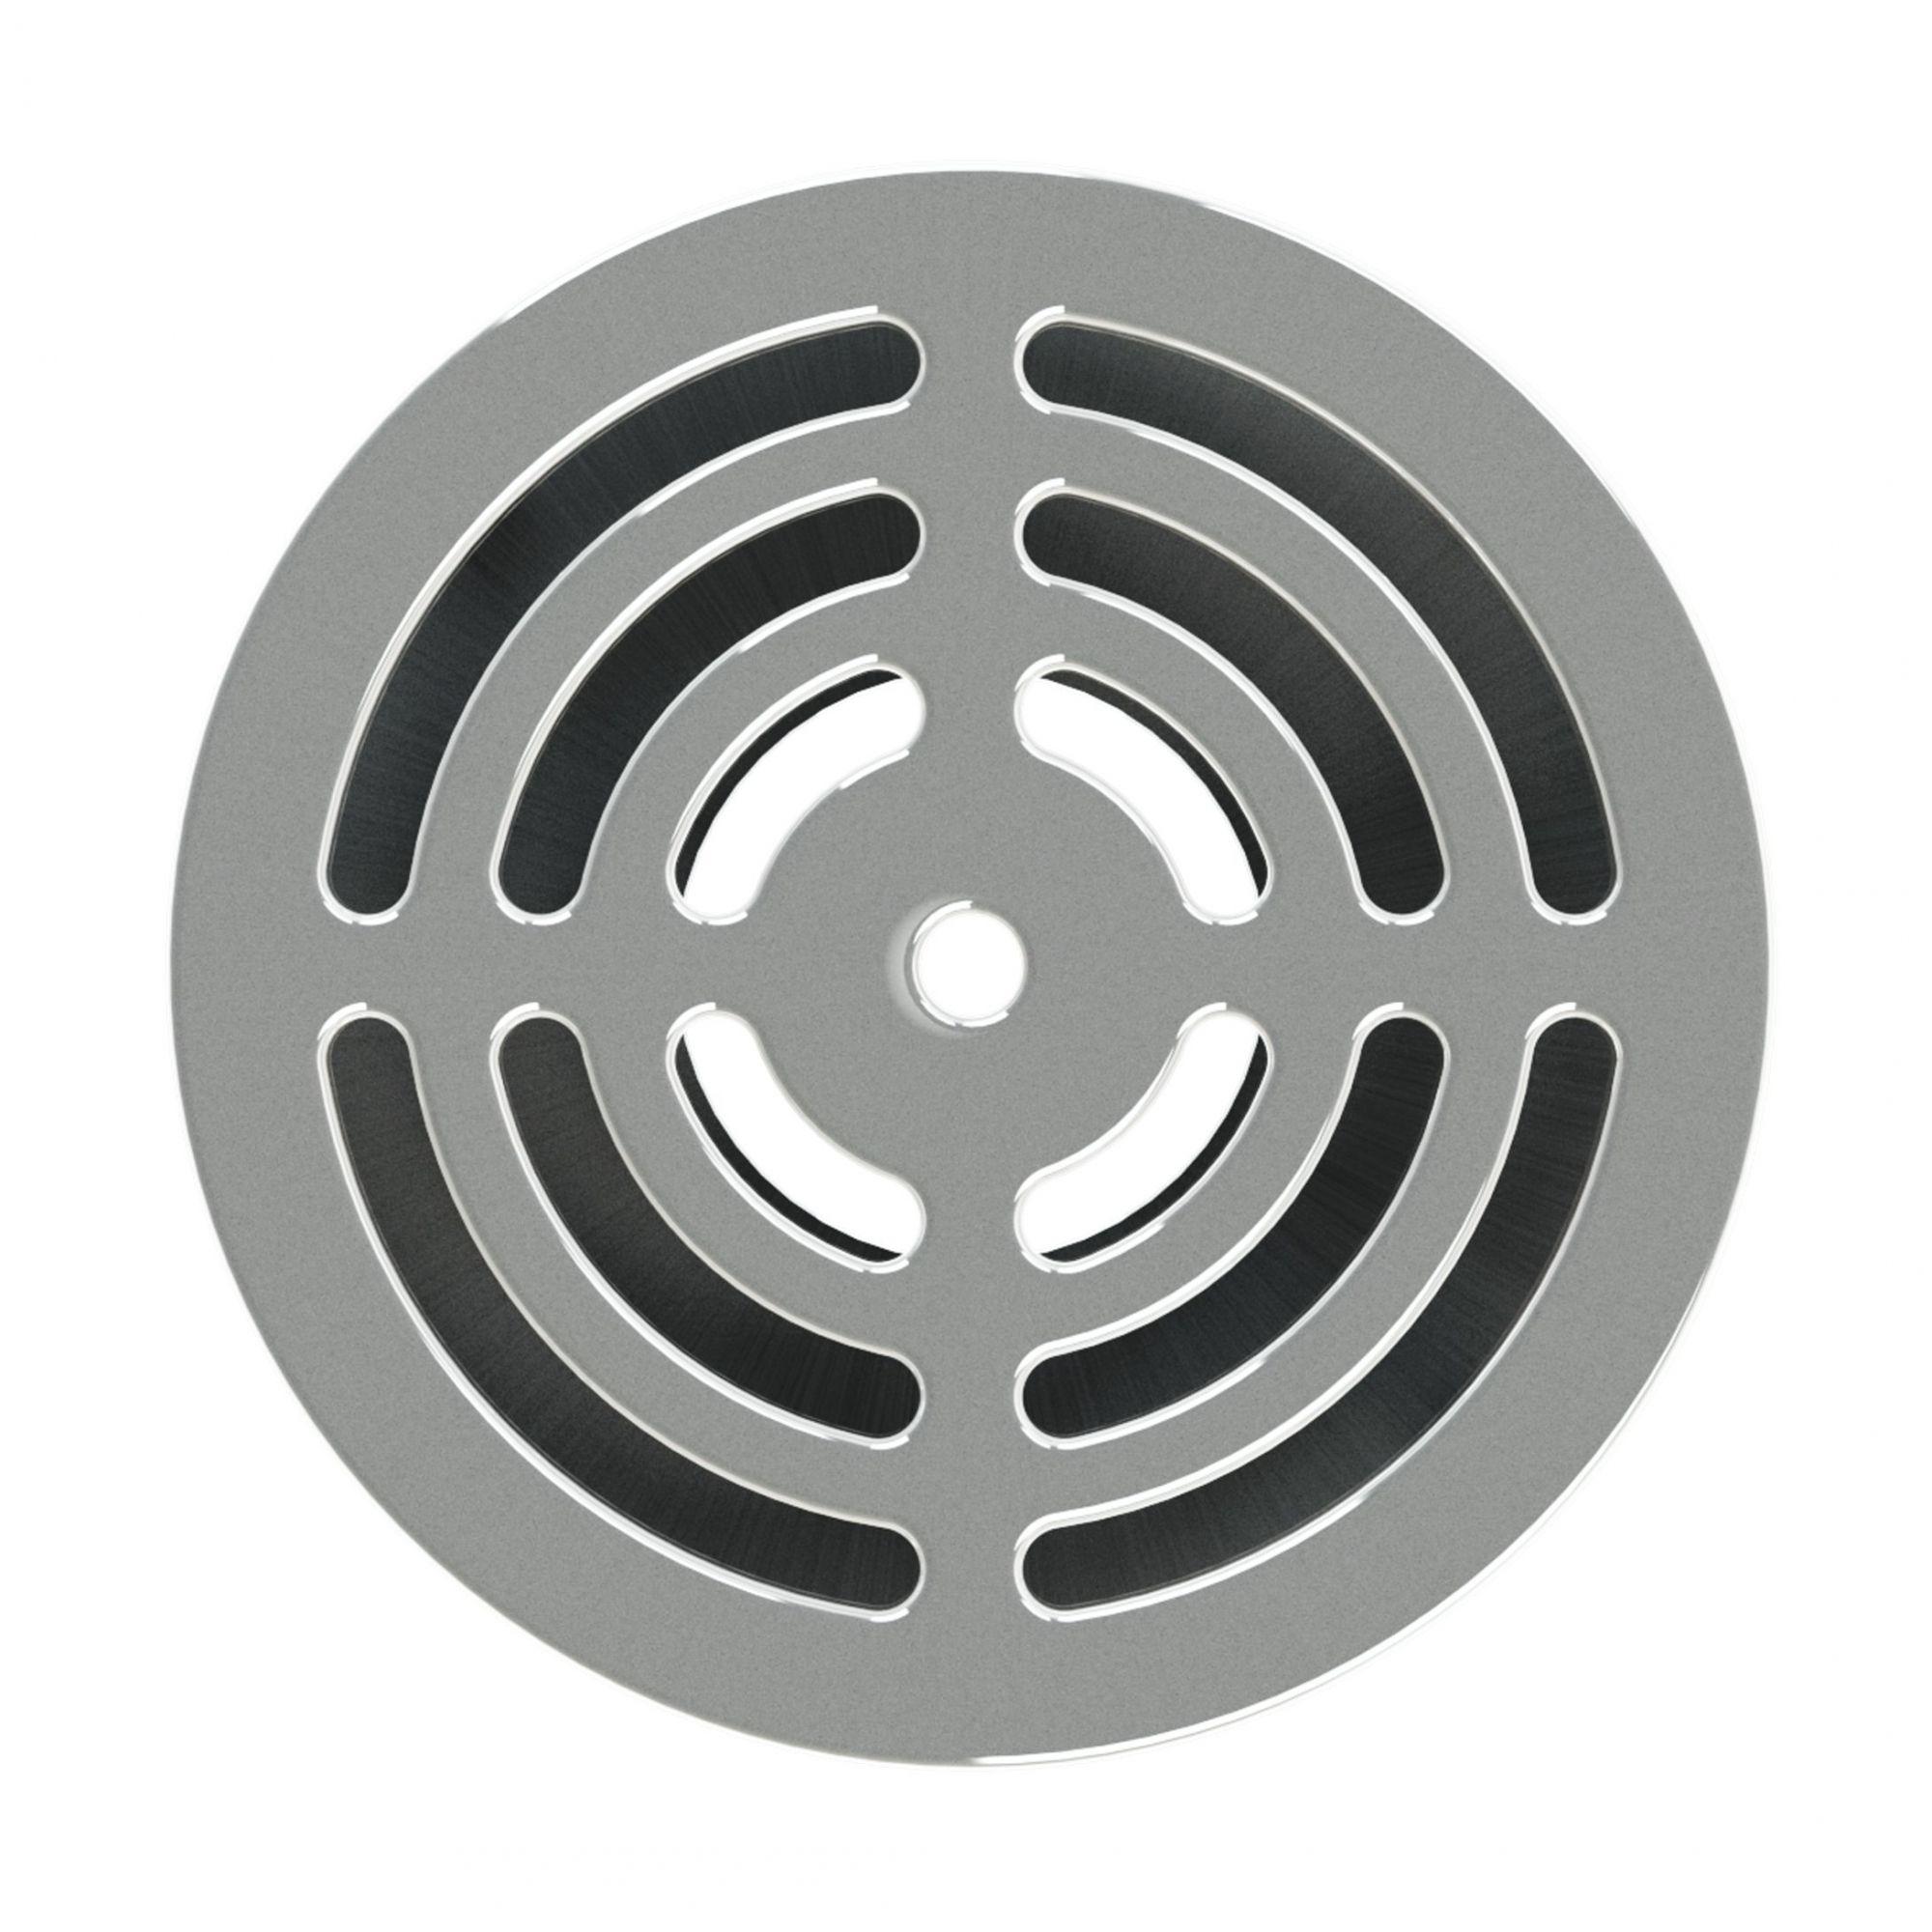 Dispositivo de Dreno Lateral Redondo Inox - Alvenaria - Tholz